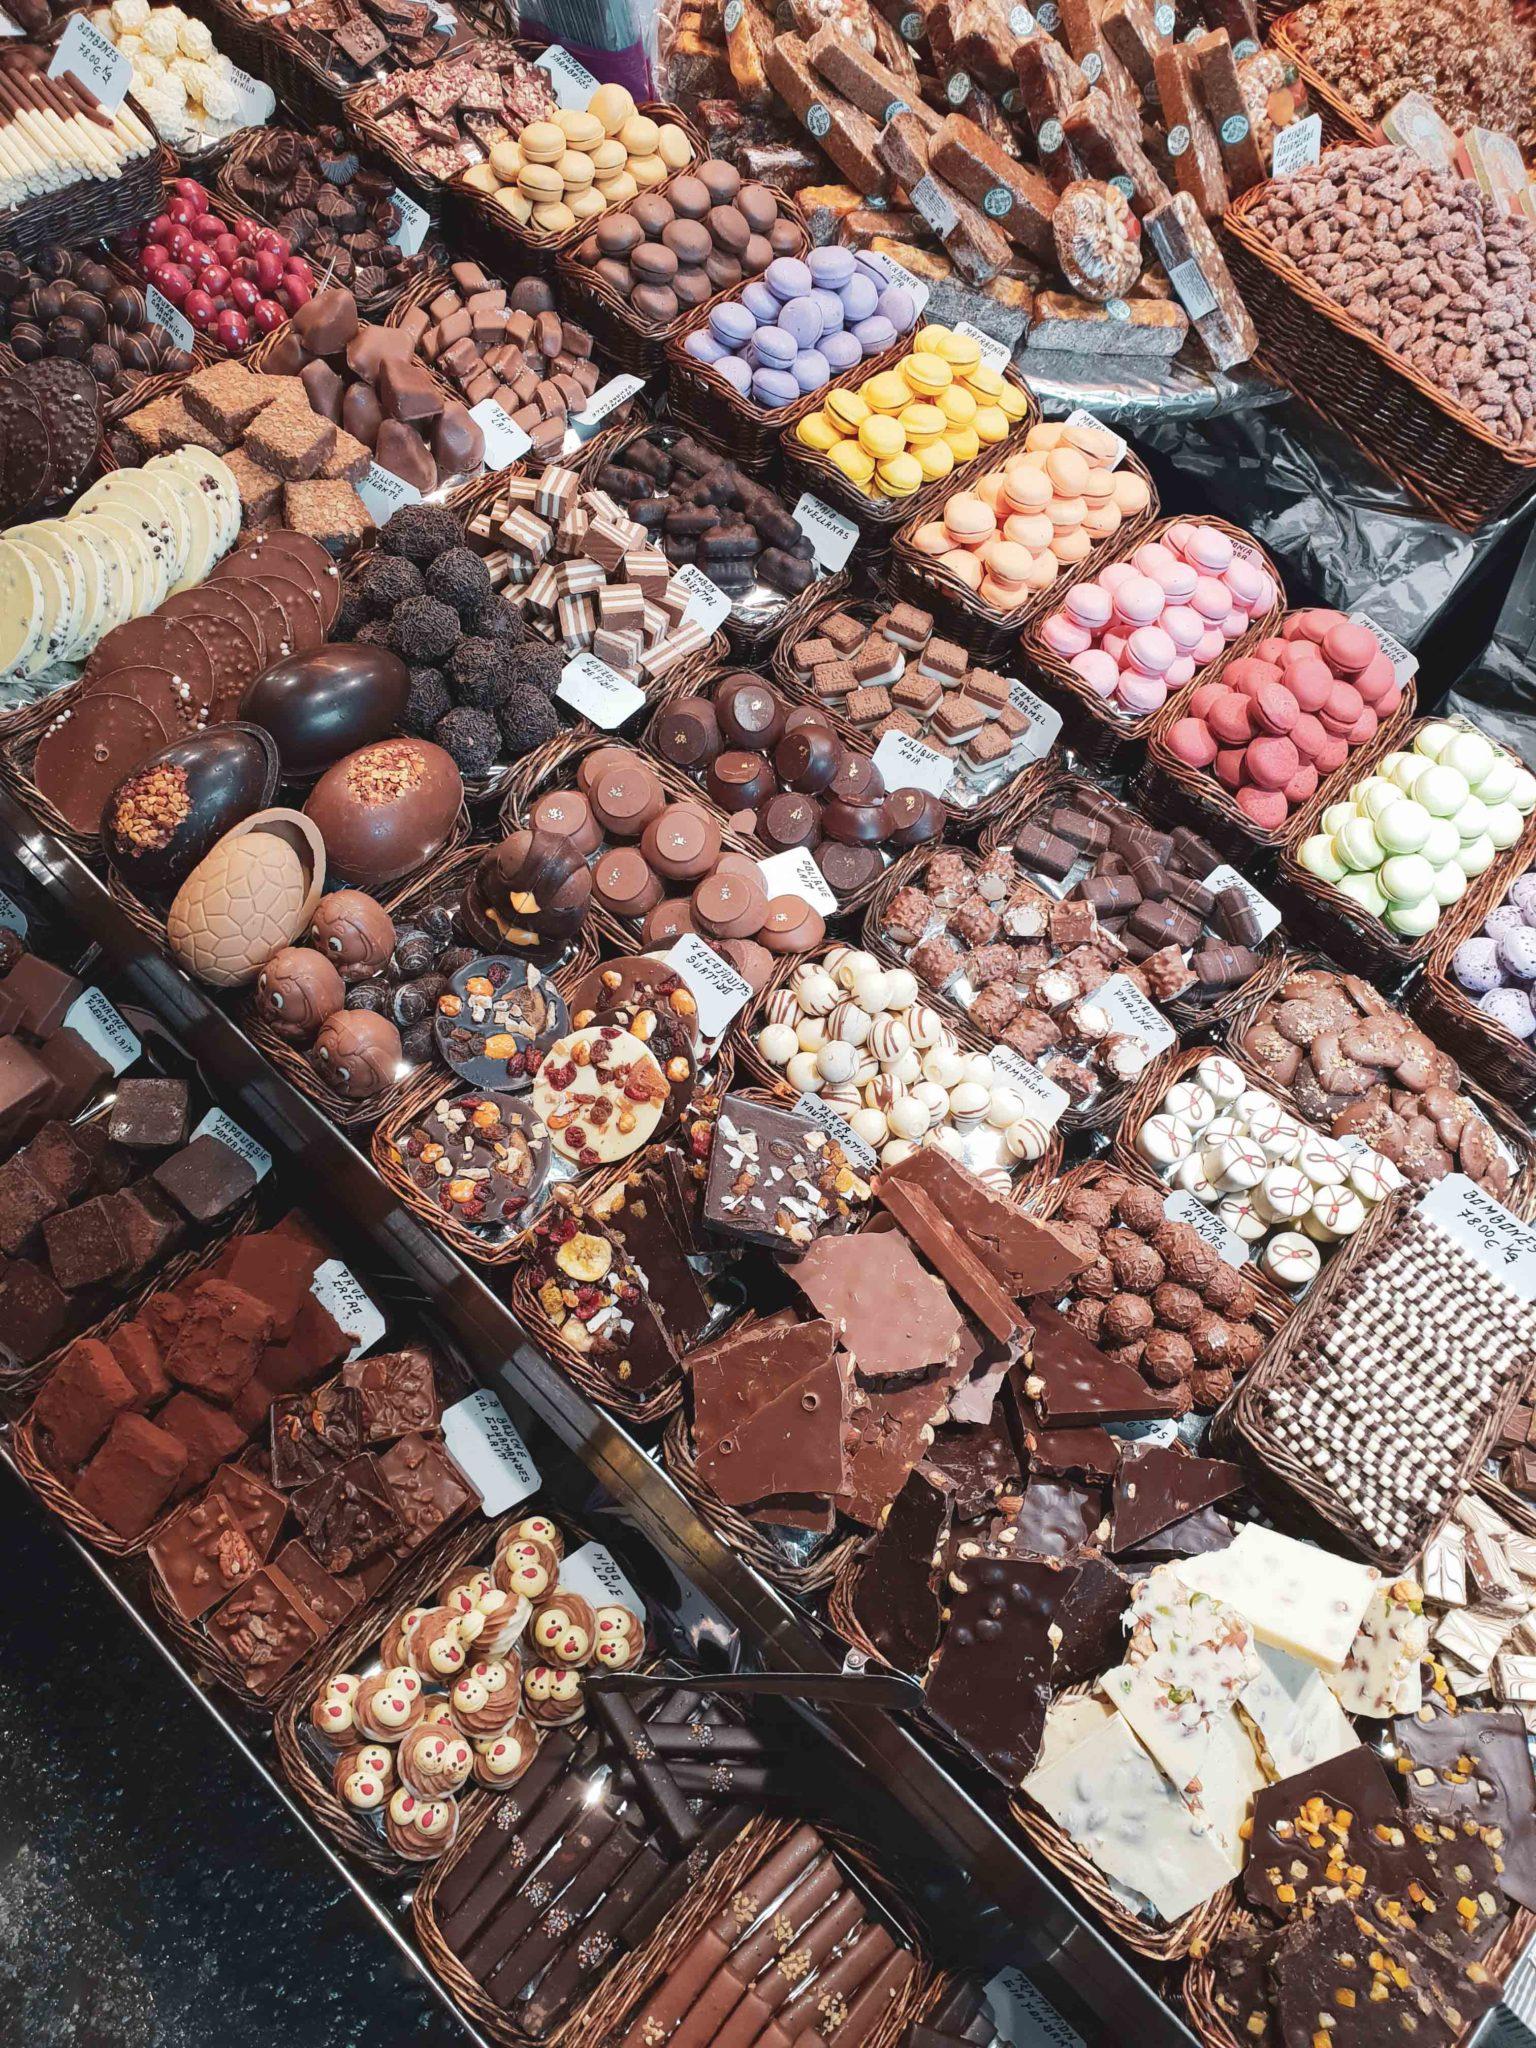 Barcelona travel guide by Michaella and Lina from Bulgarian lifestyle blog Quite a Looker / Mercat de la Boqueria Food market